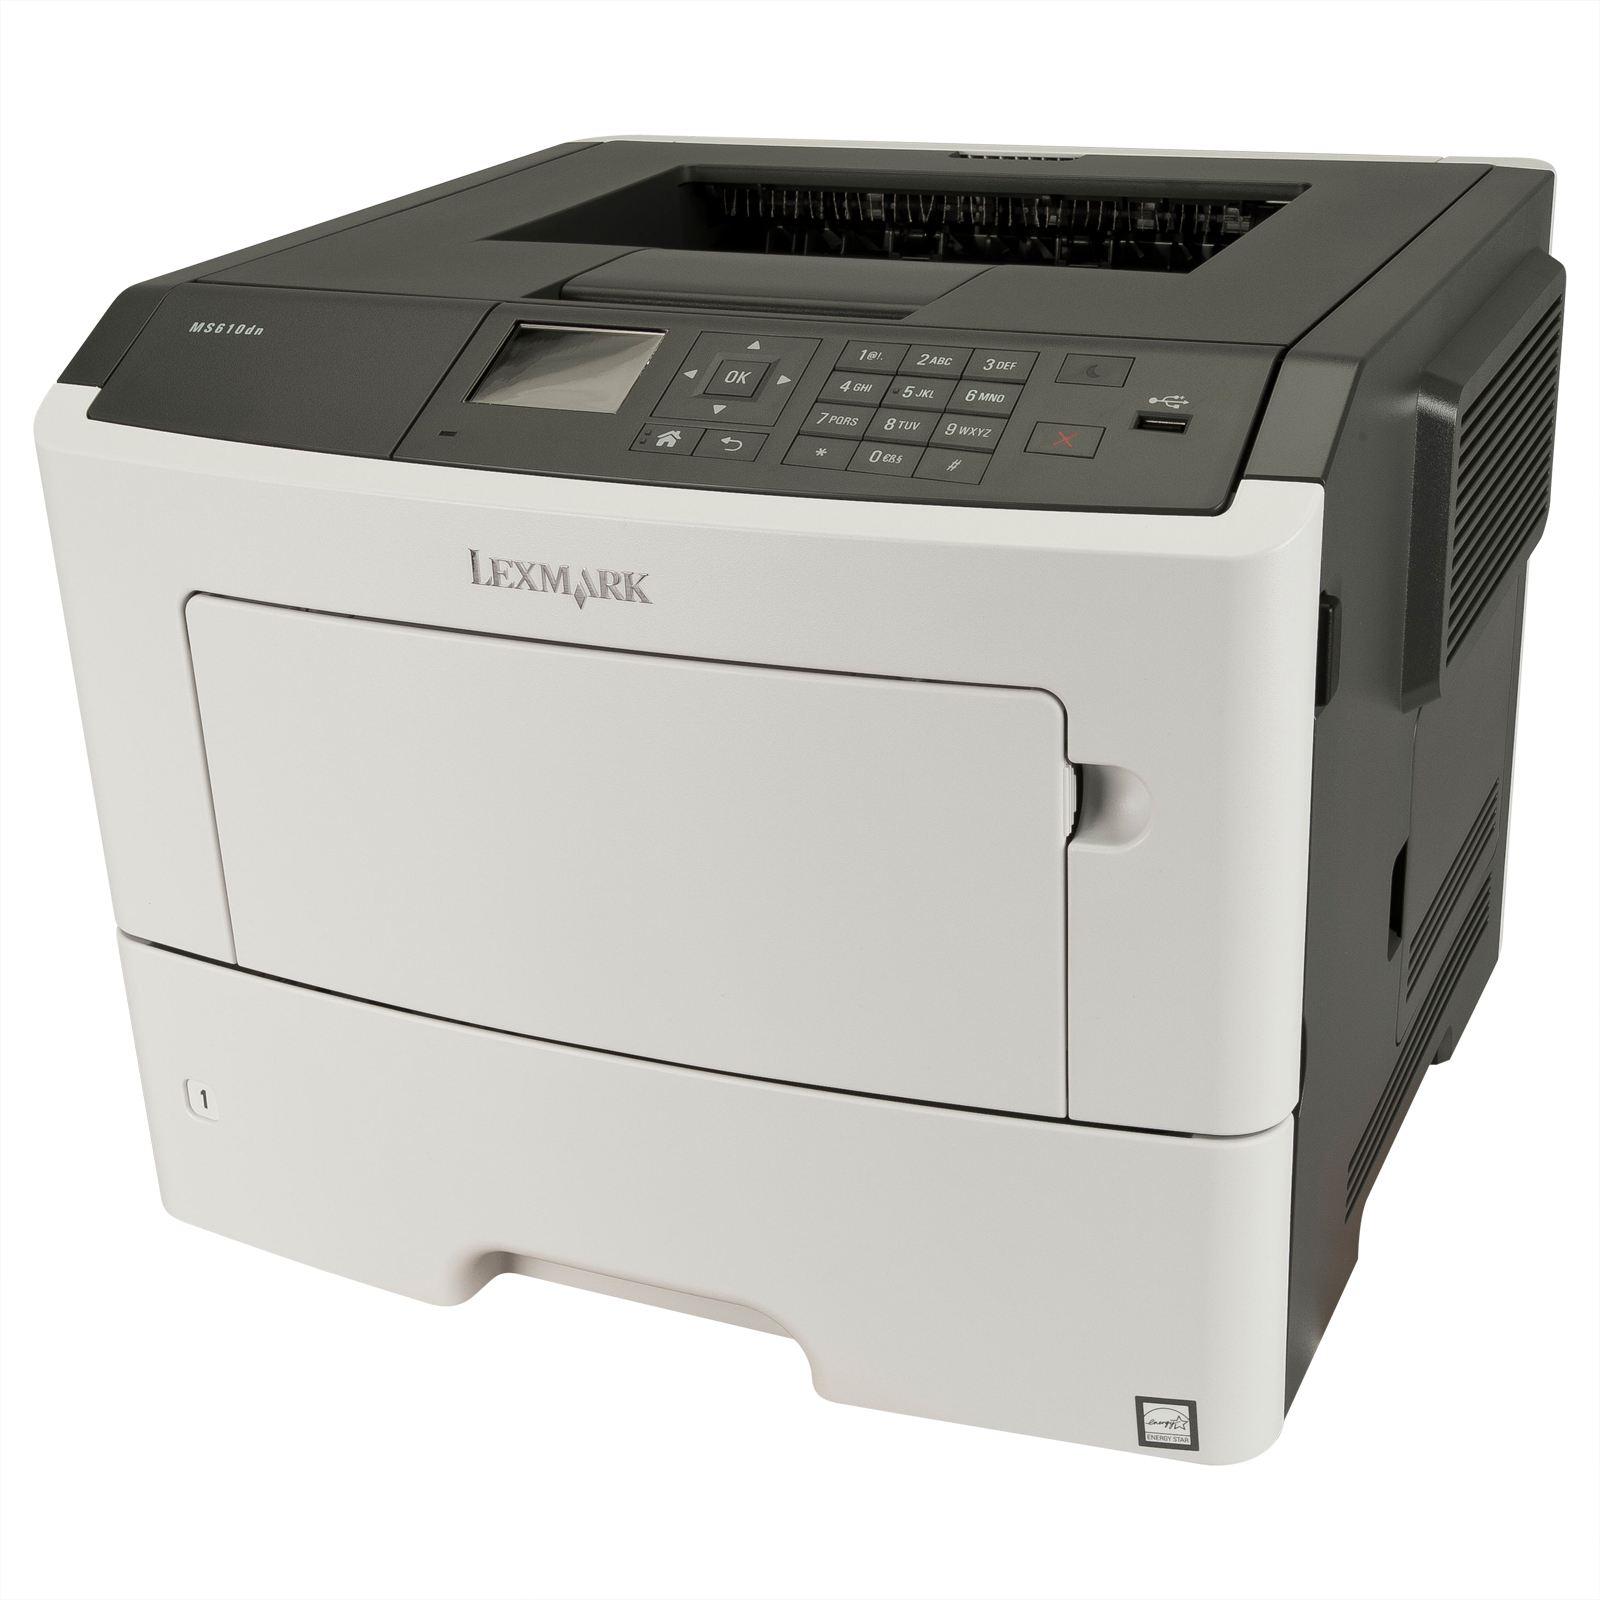 Lexmark MS610dn,A4,1200x1200dpi,47ppm,duplex,LAN